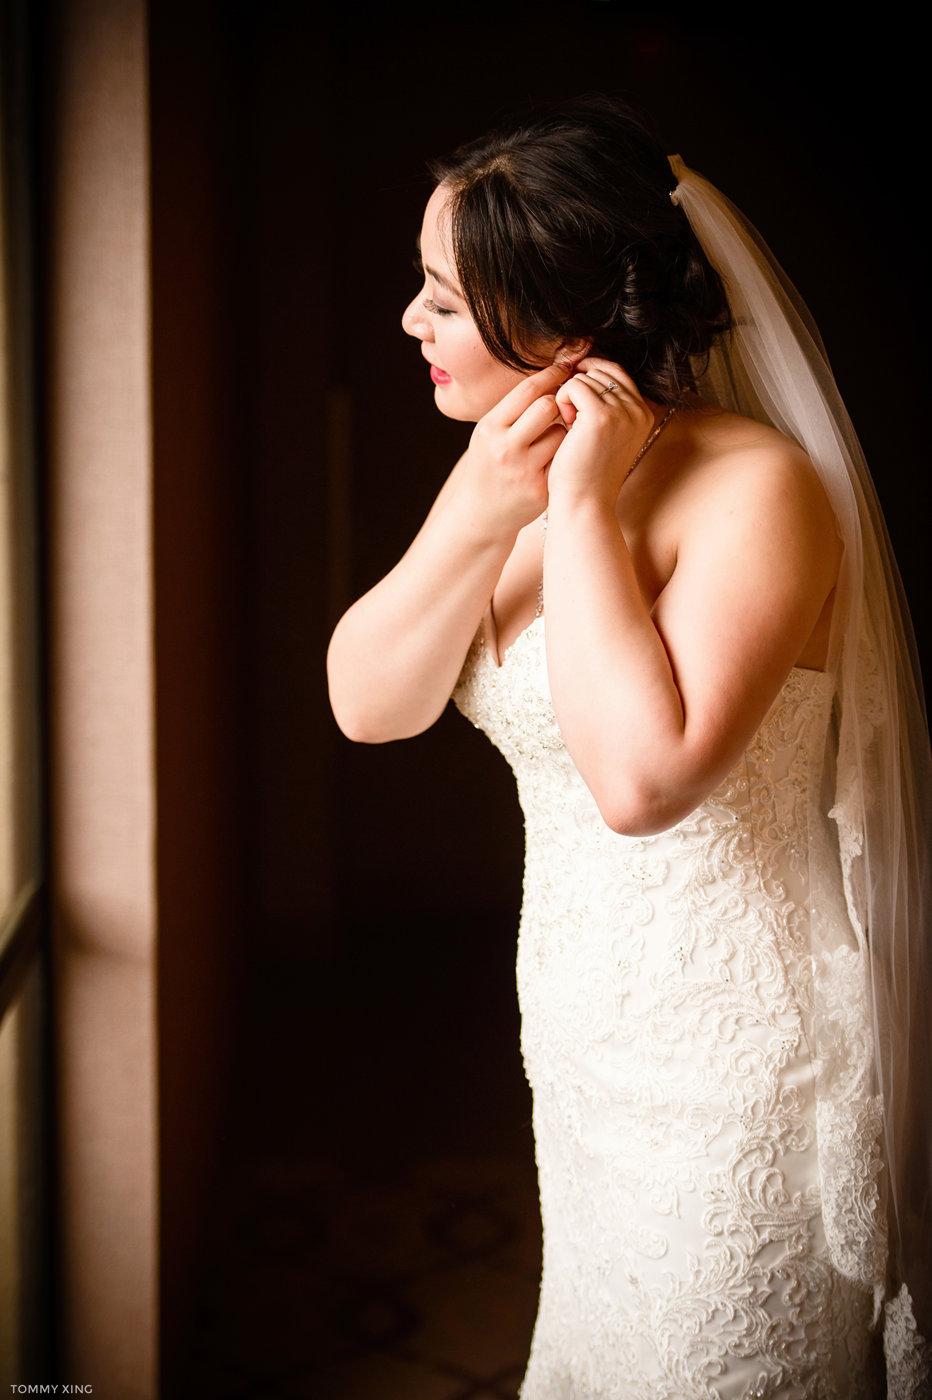 STANFORD MEMORIAL CHURCH WEDDING - Wenjie & Chengcheng - SAN FRANCISCO BAY AREA 斯坦福教堂婚礼跟拍 - 洛杉矶婚礼婚纱照摄影师 Tommy Xing Photography042.jpg